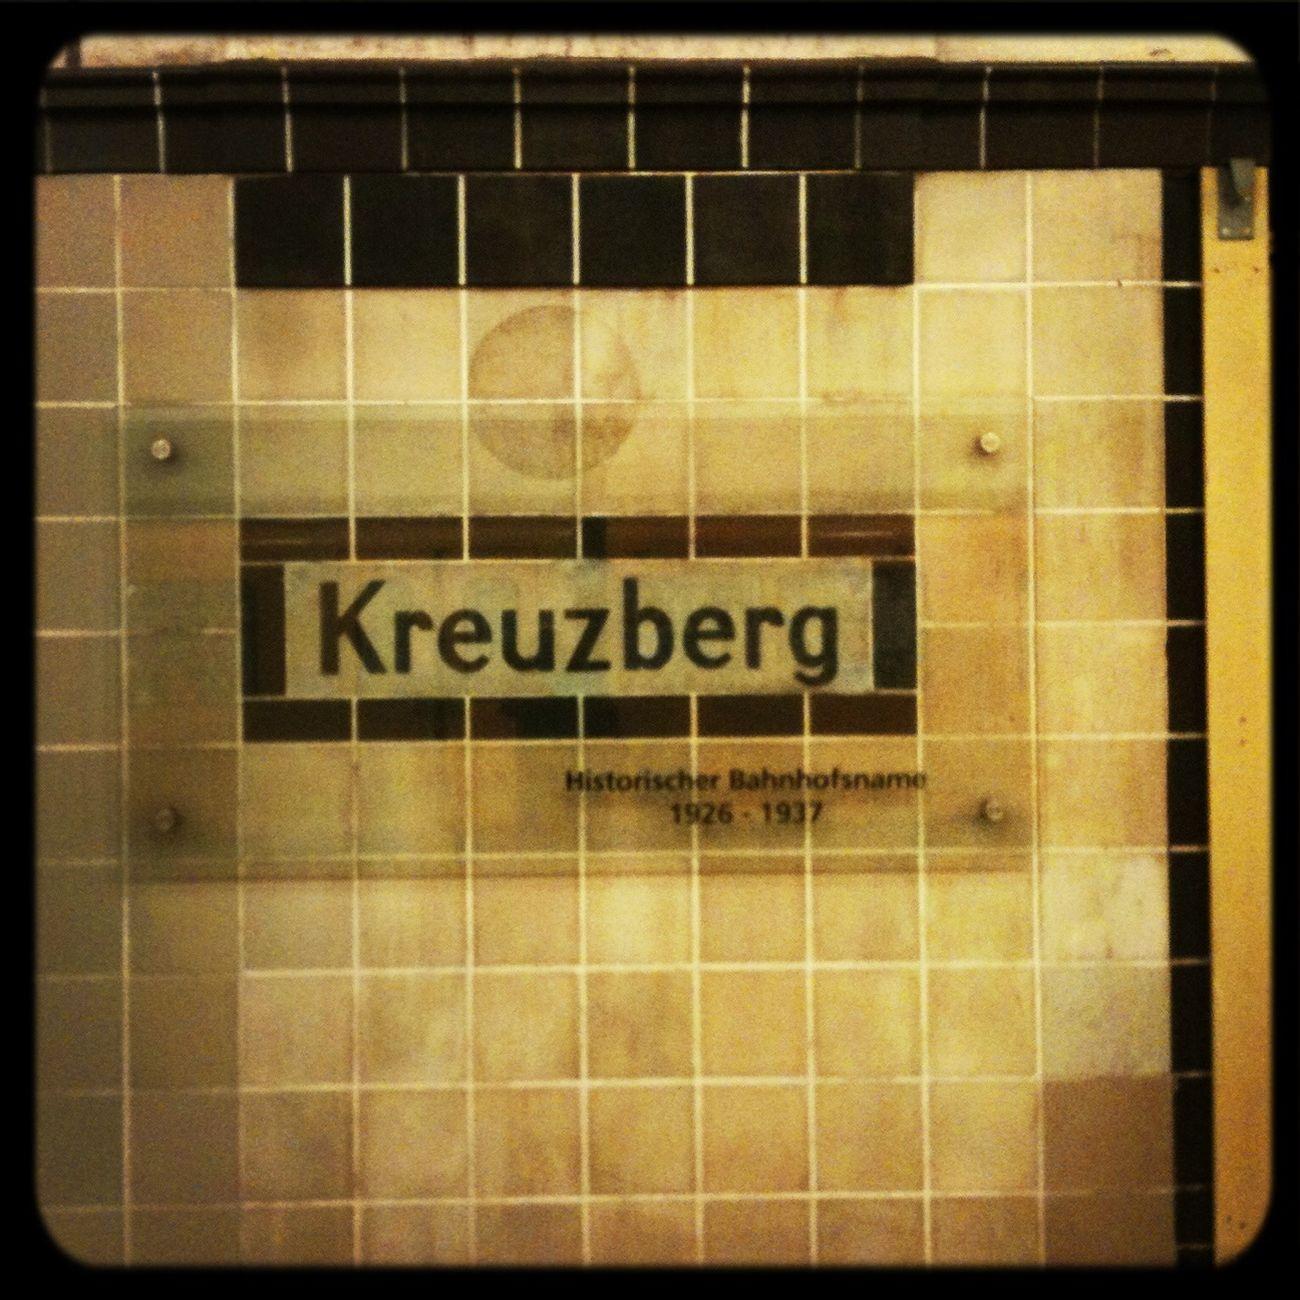 I'm at U-Bhf Kreuzberg.